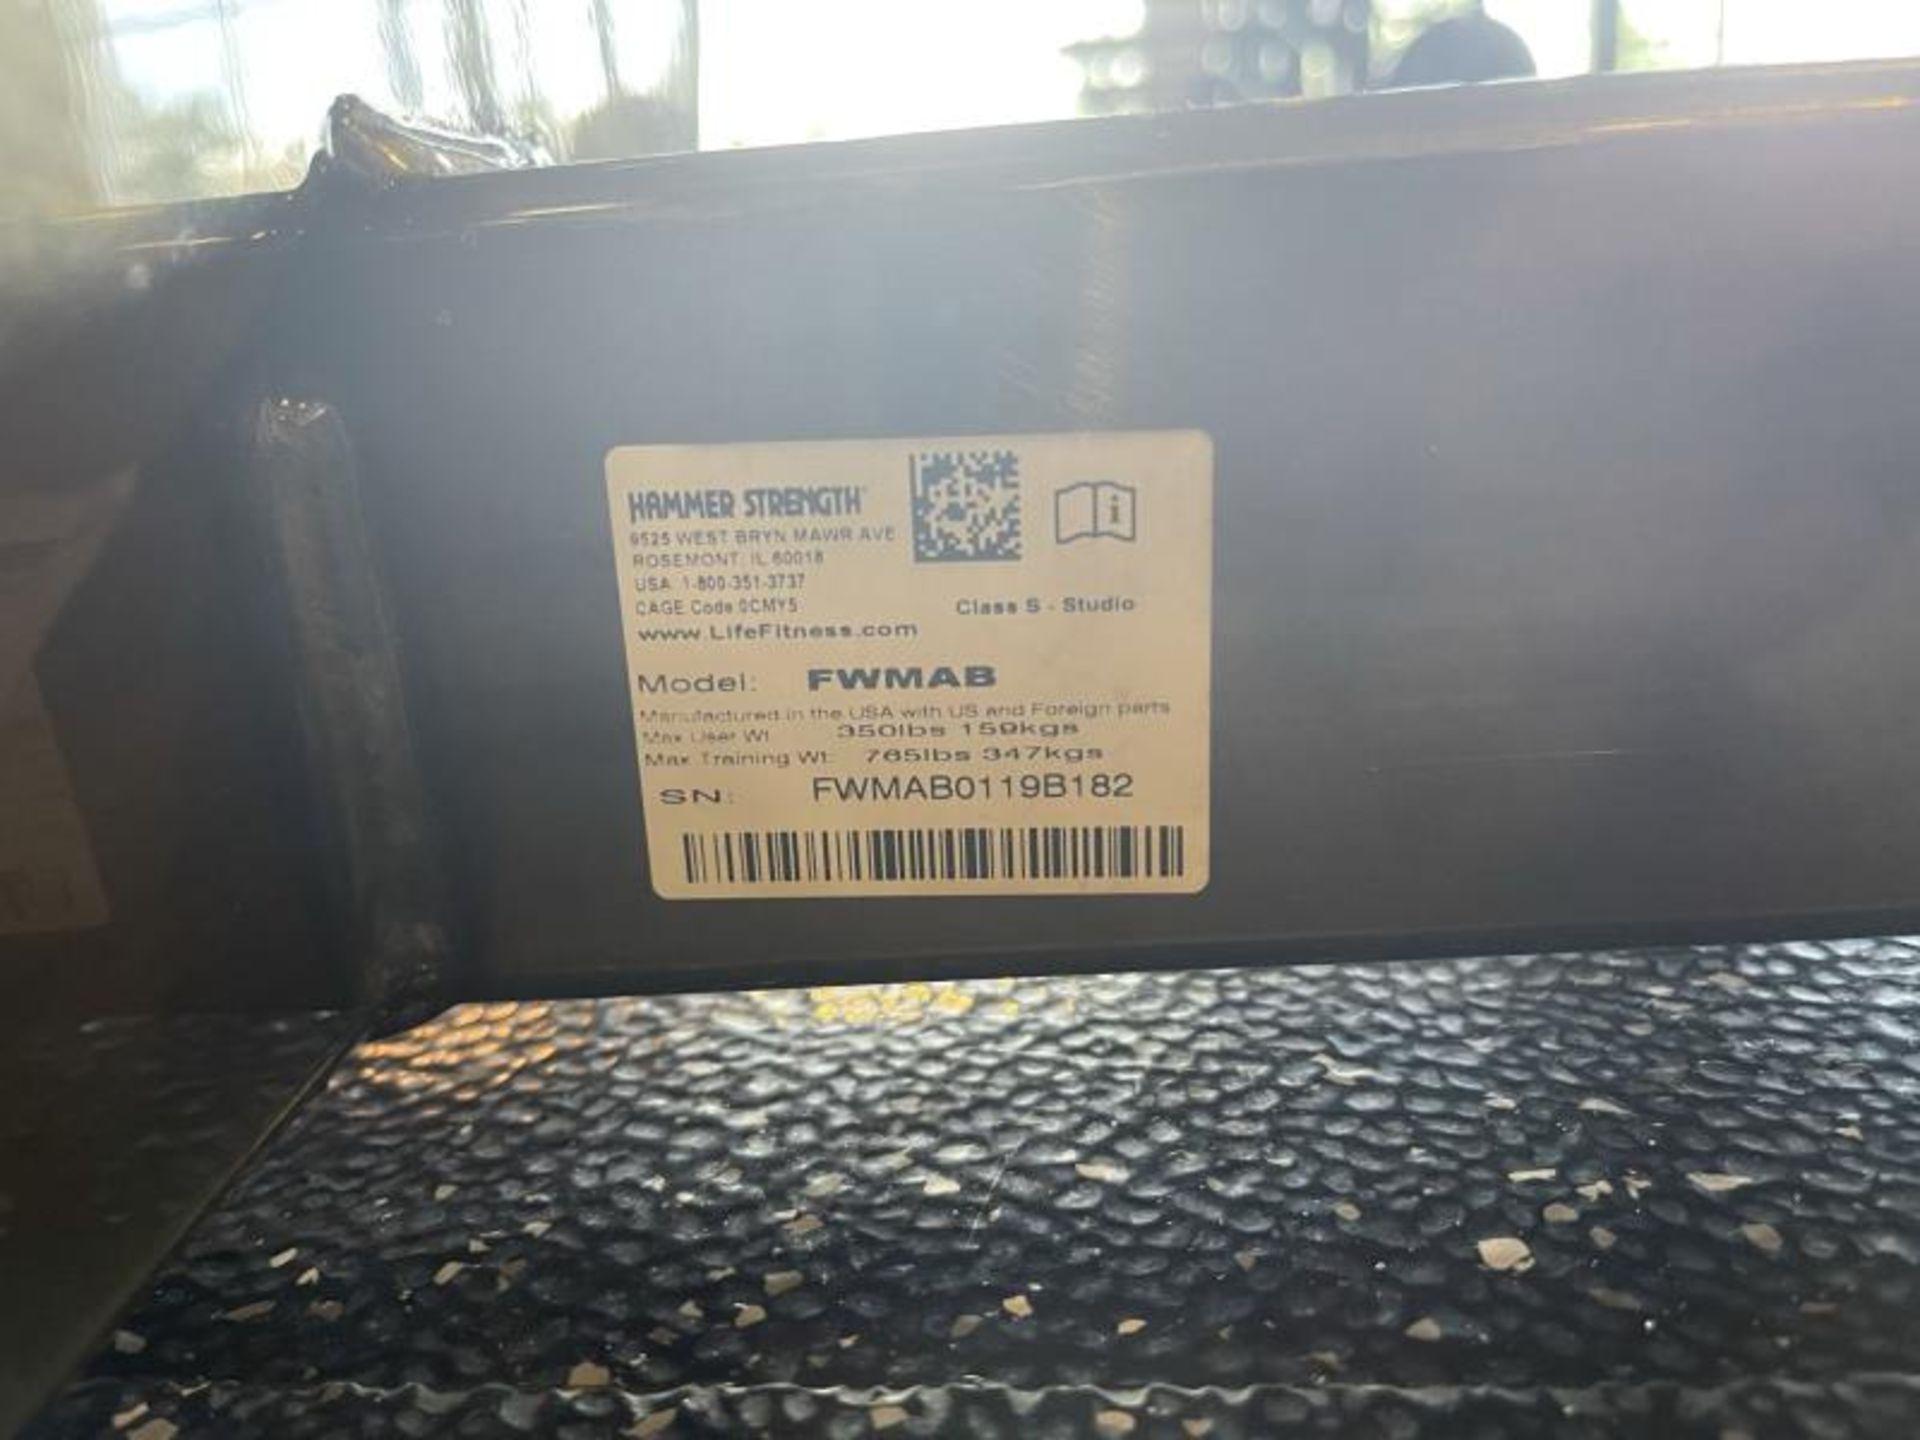 Hammer Strength Multi Adjustable Bench M: FWMAB - Image 4 of 4